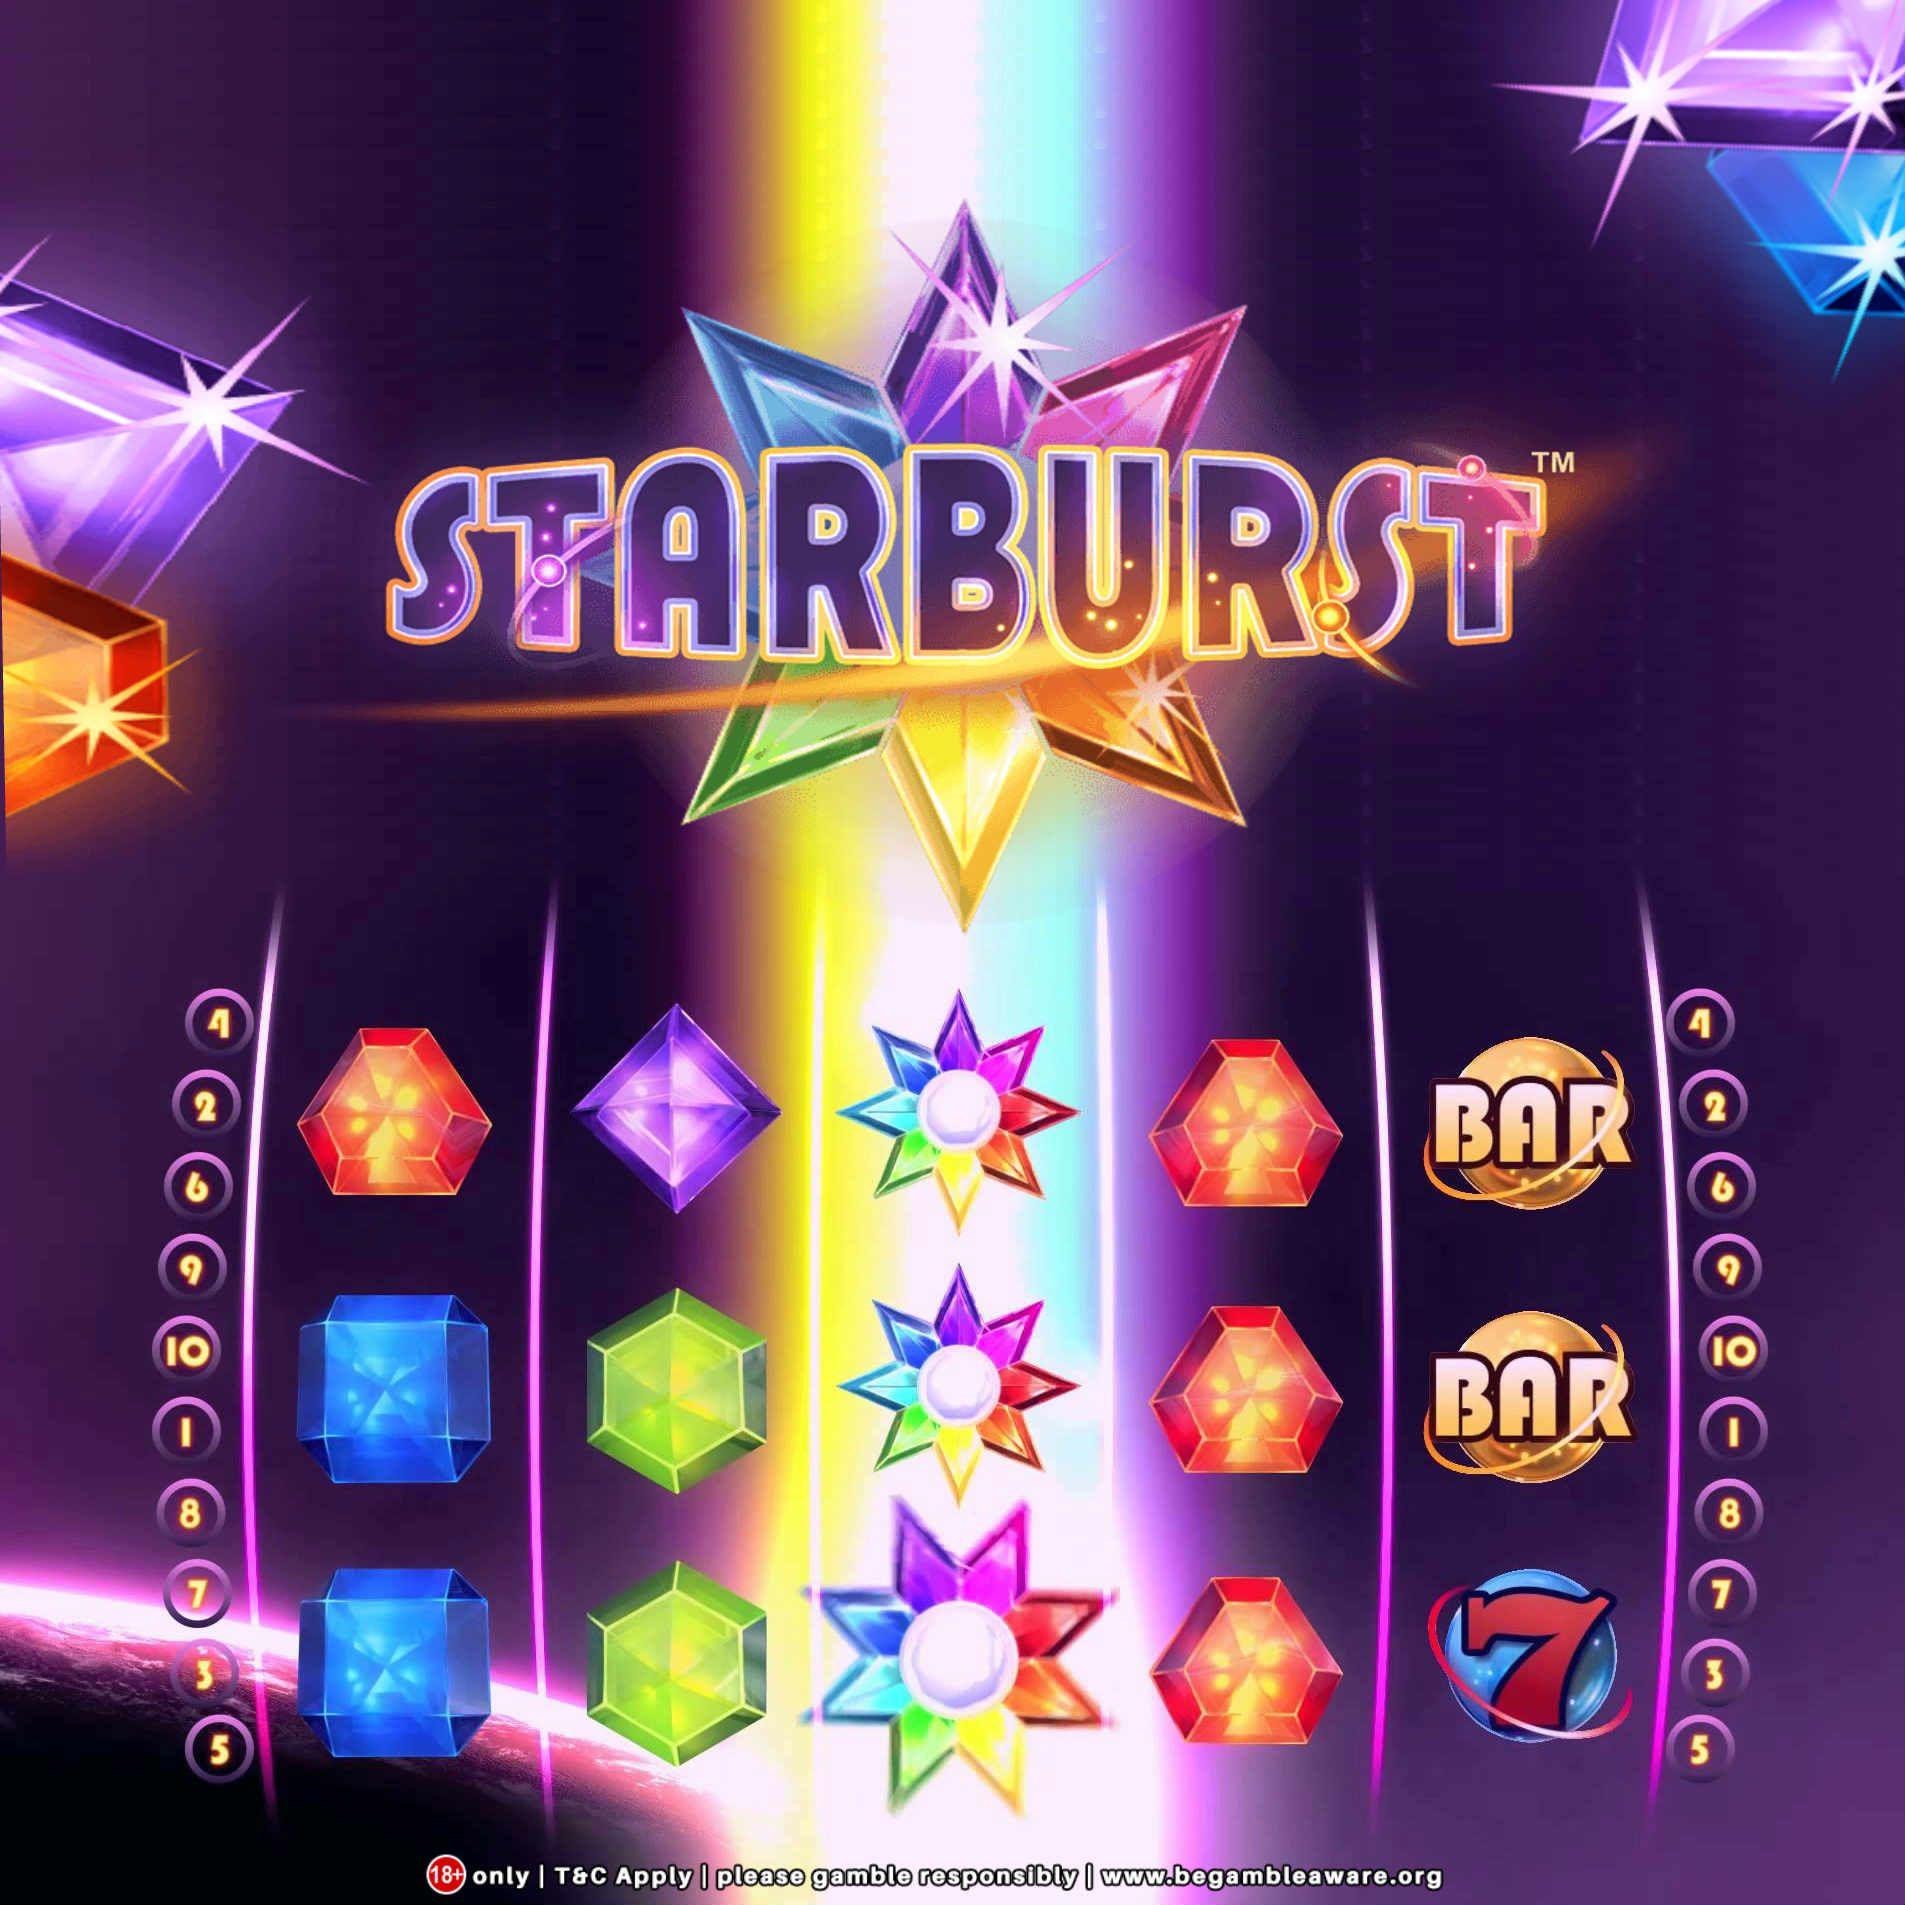 Phone Slots UK Bonus (With images) Starburst, Casino